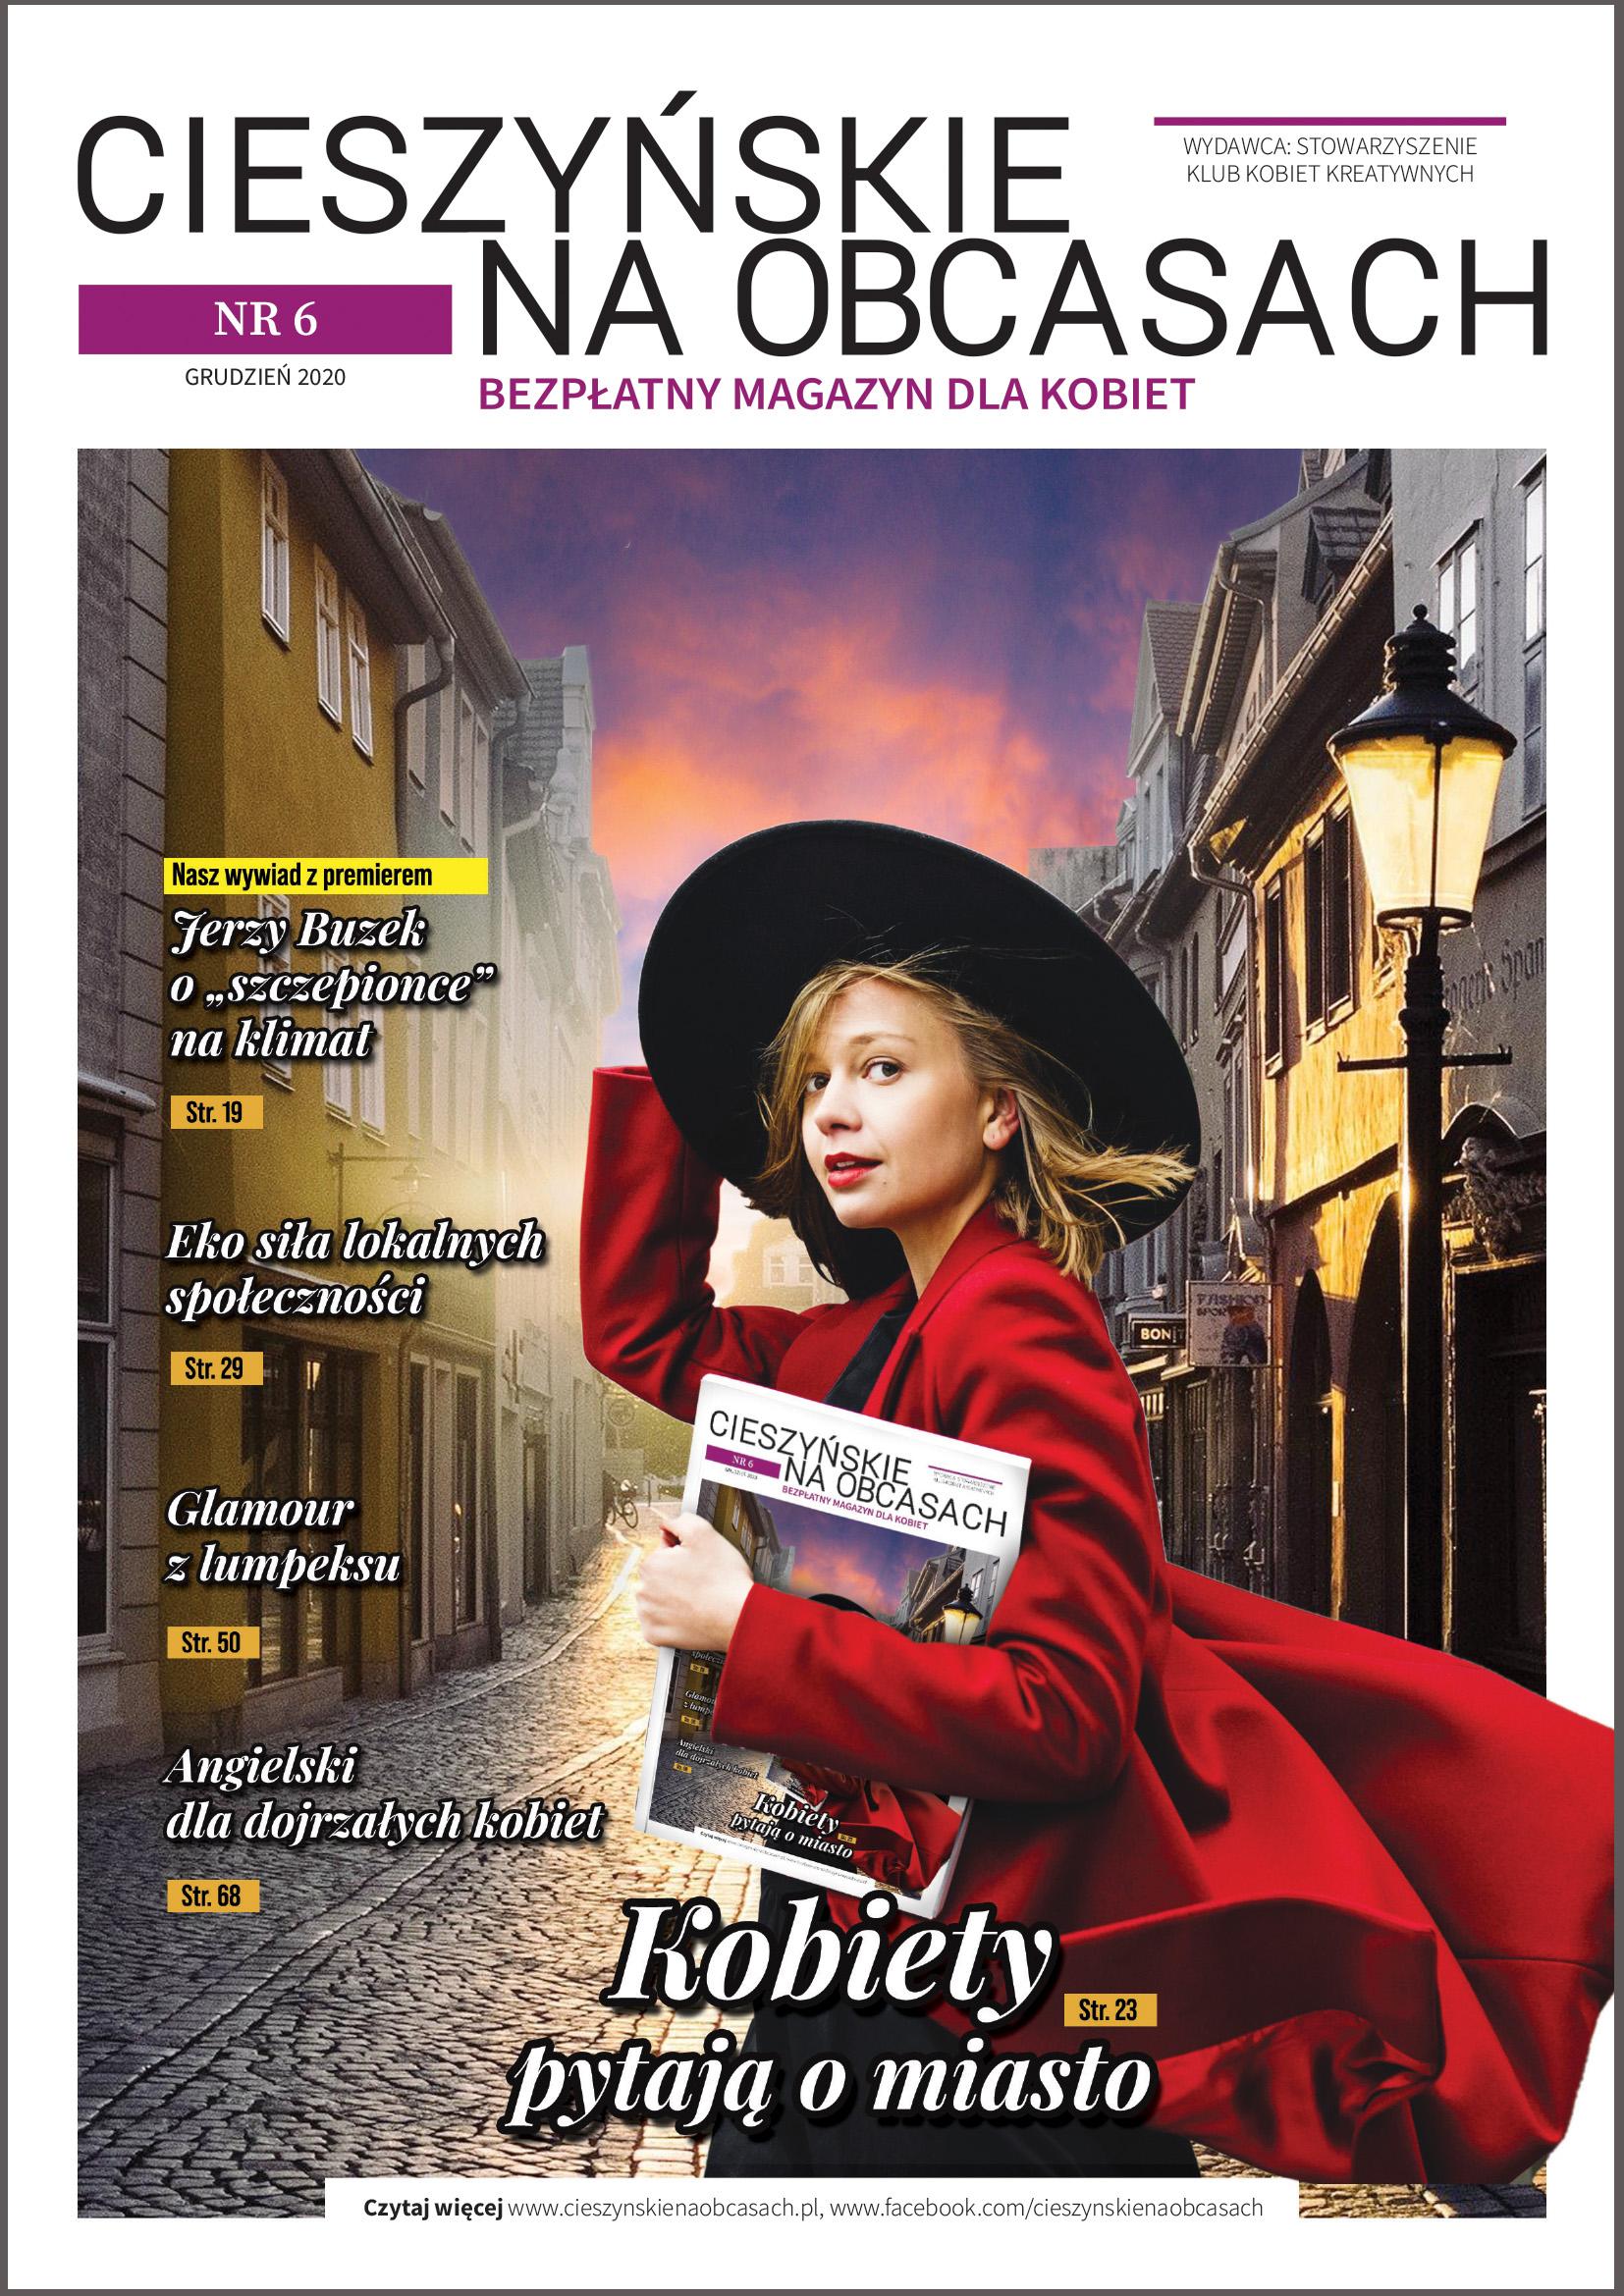 Magazyn dla kobiet CIESZYŃSKIE NA OBCASACH